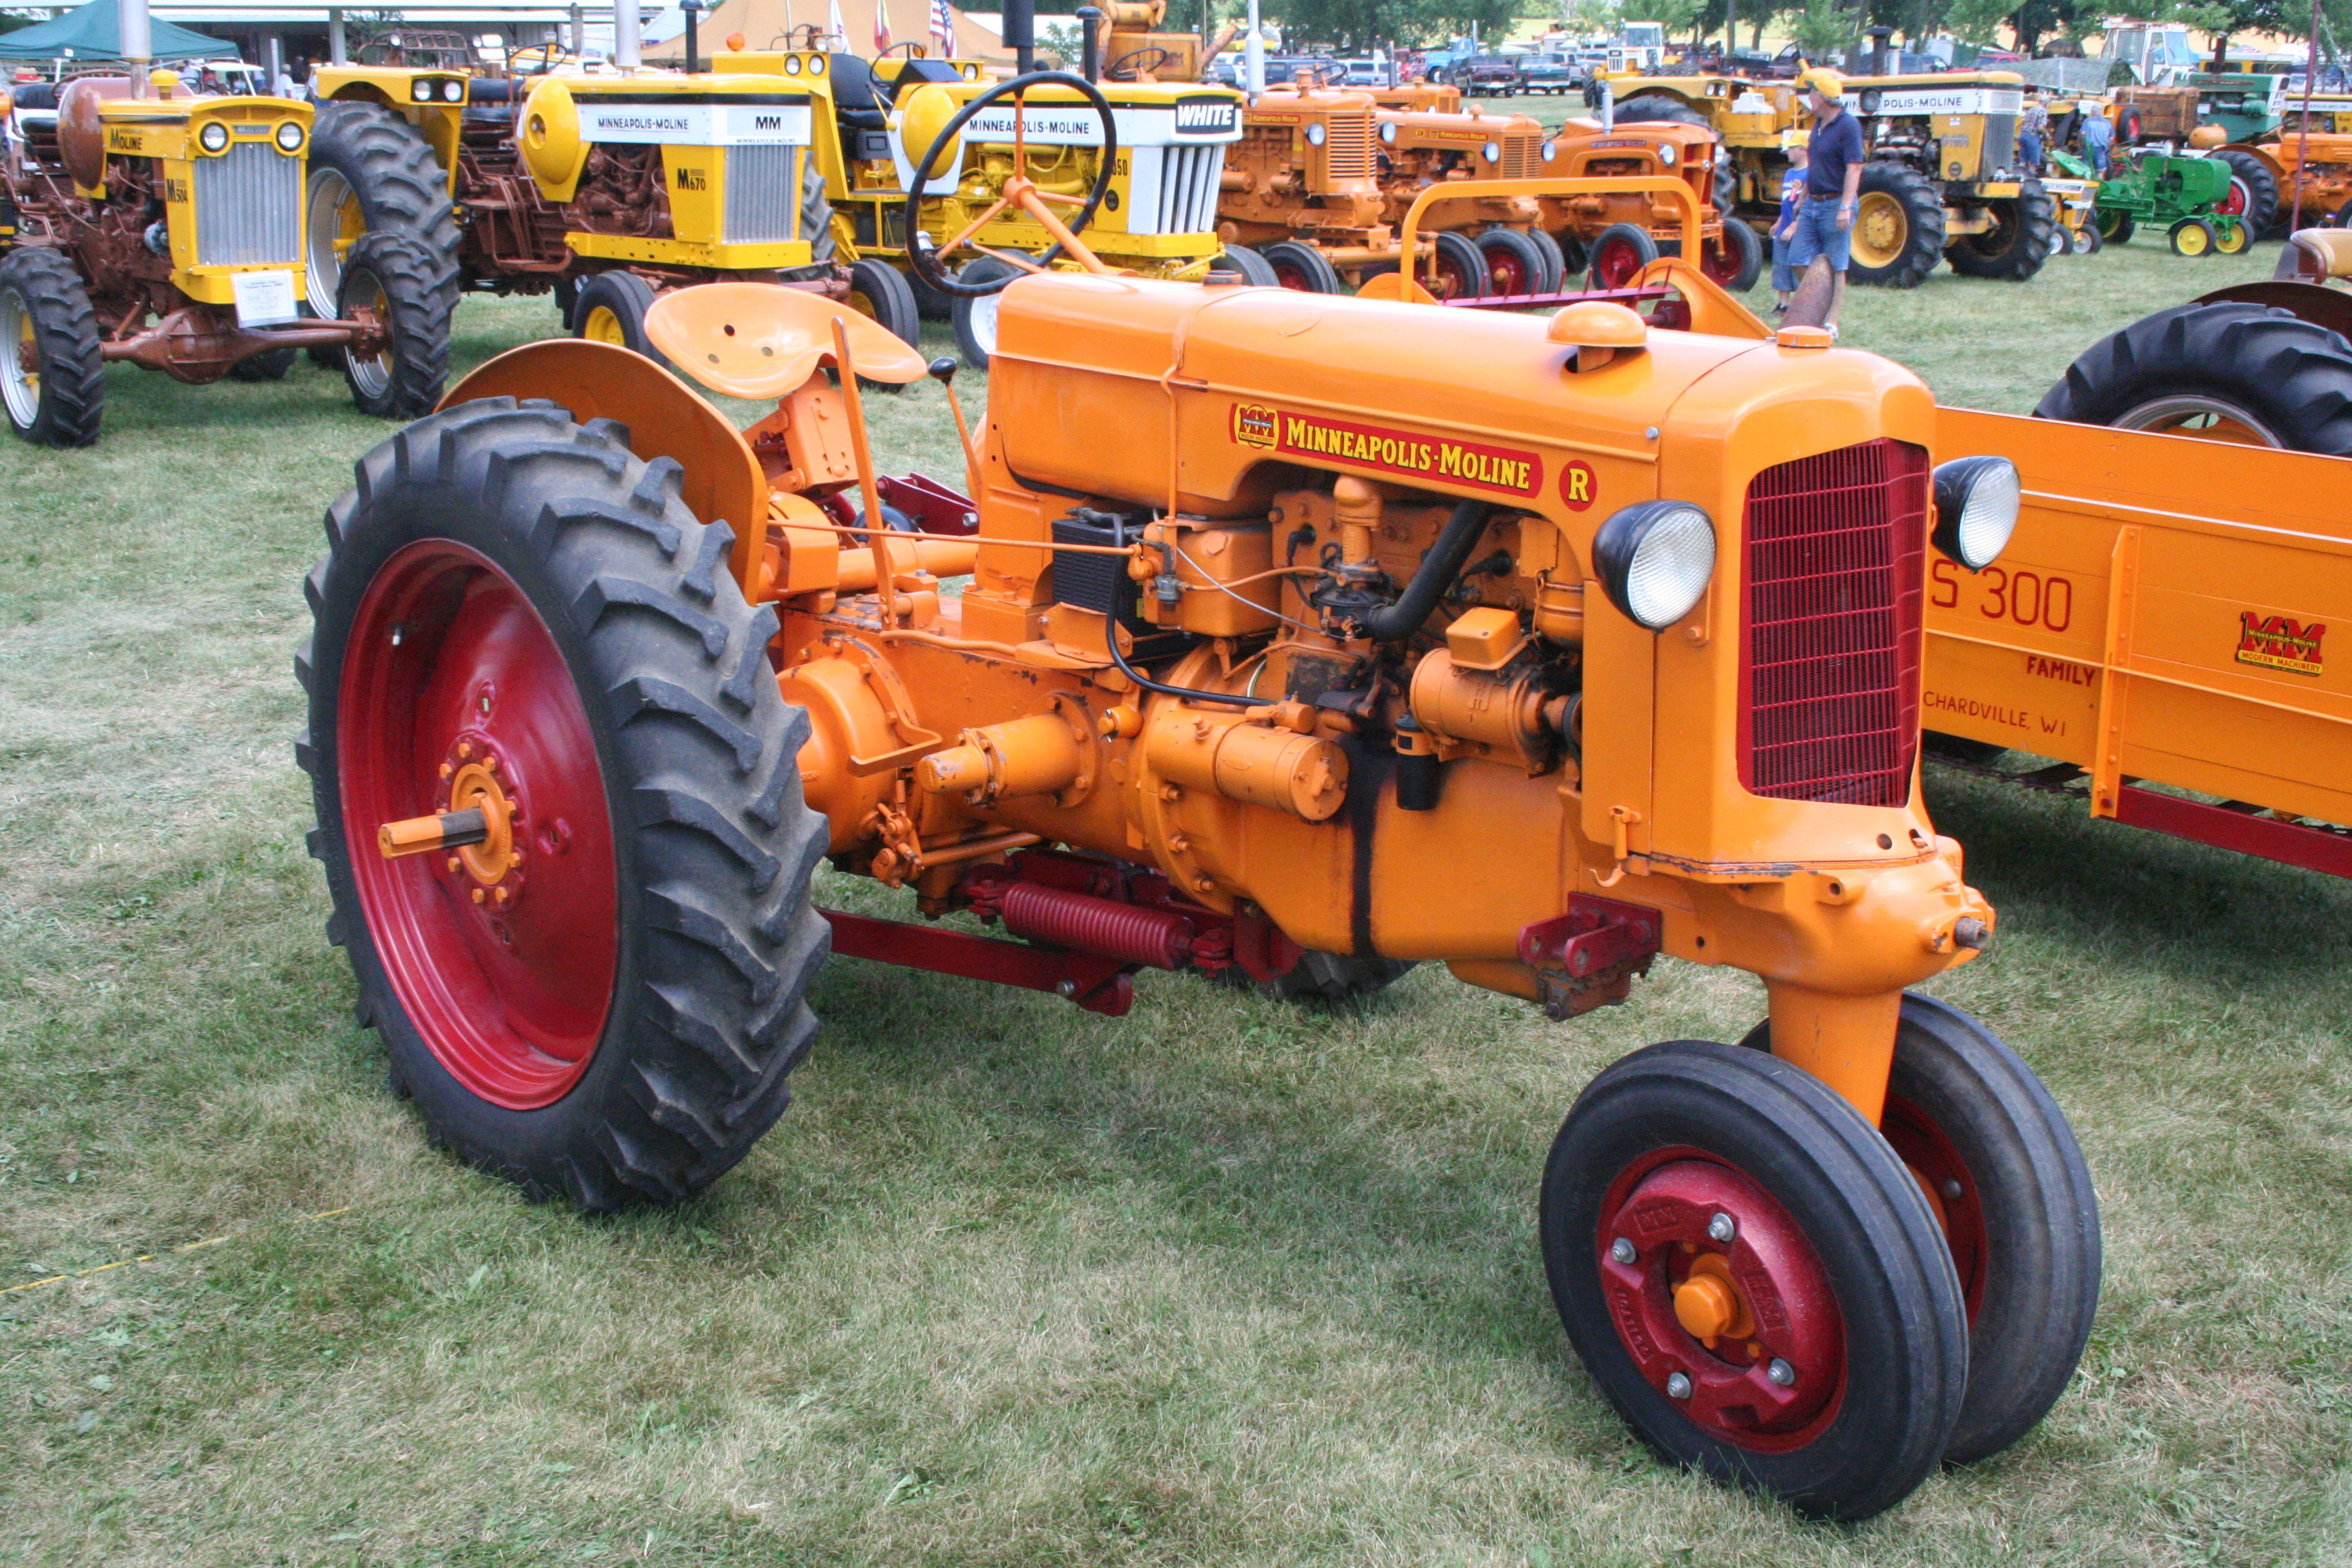 Minneapolis Moline Tractors 2 Dcapc